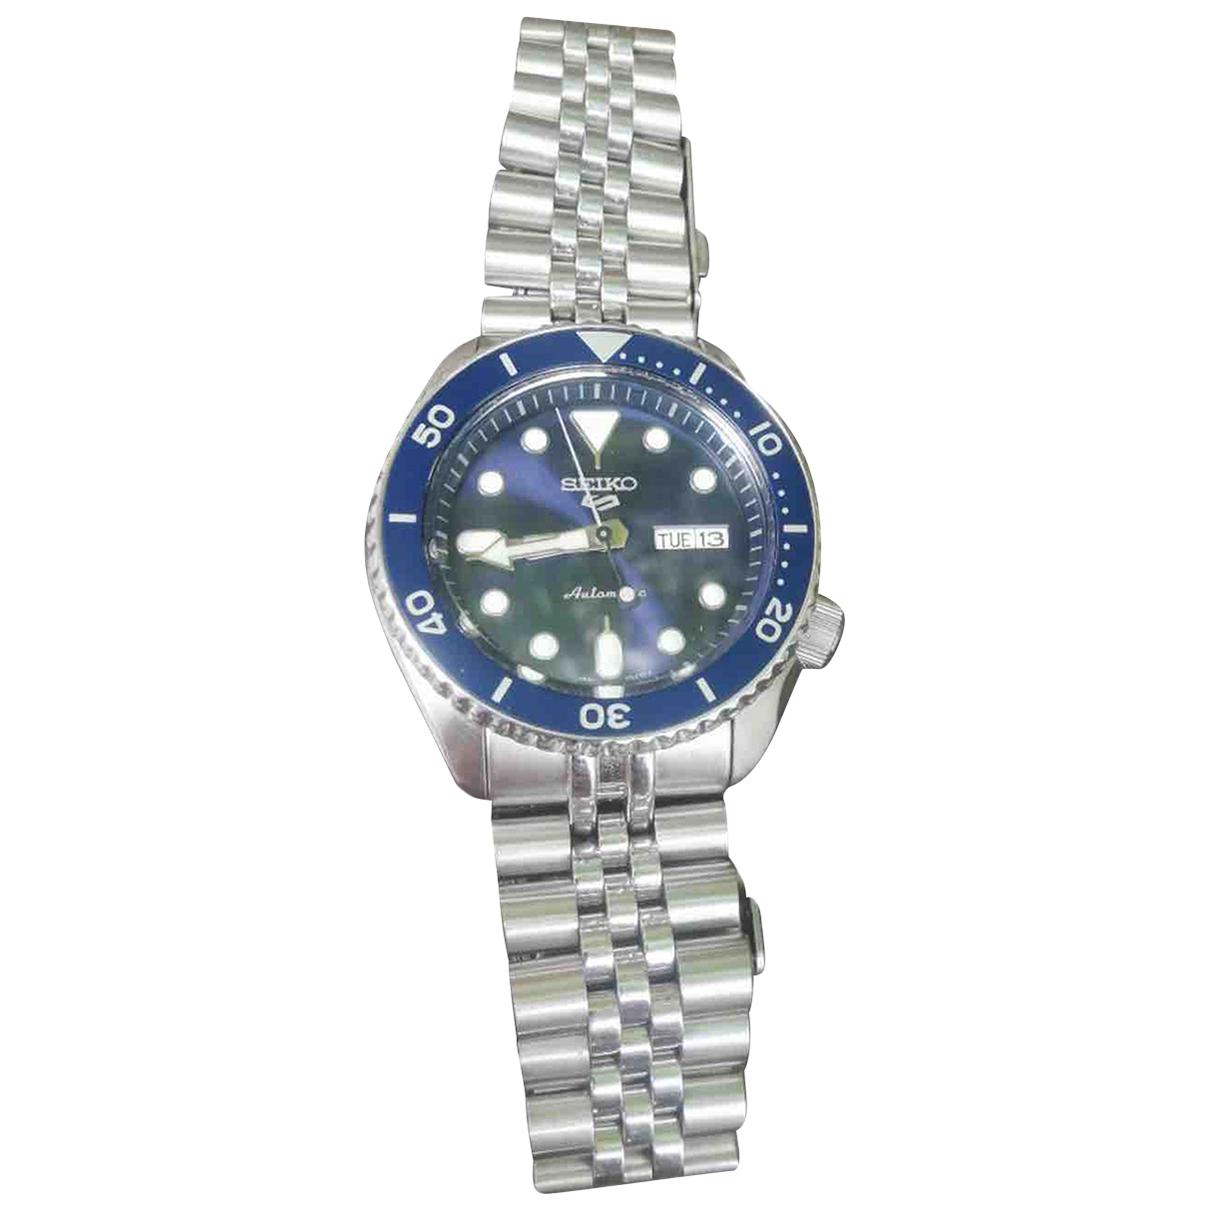 Seiko N Metallic Steel watch for Men N